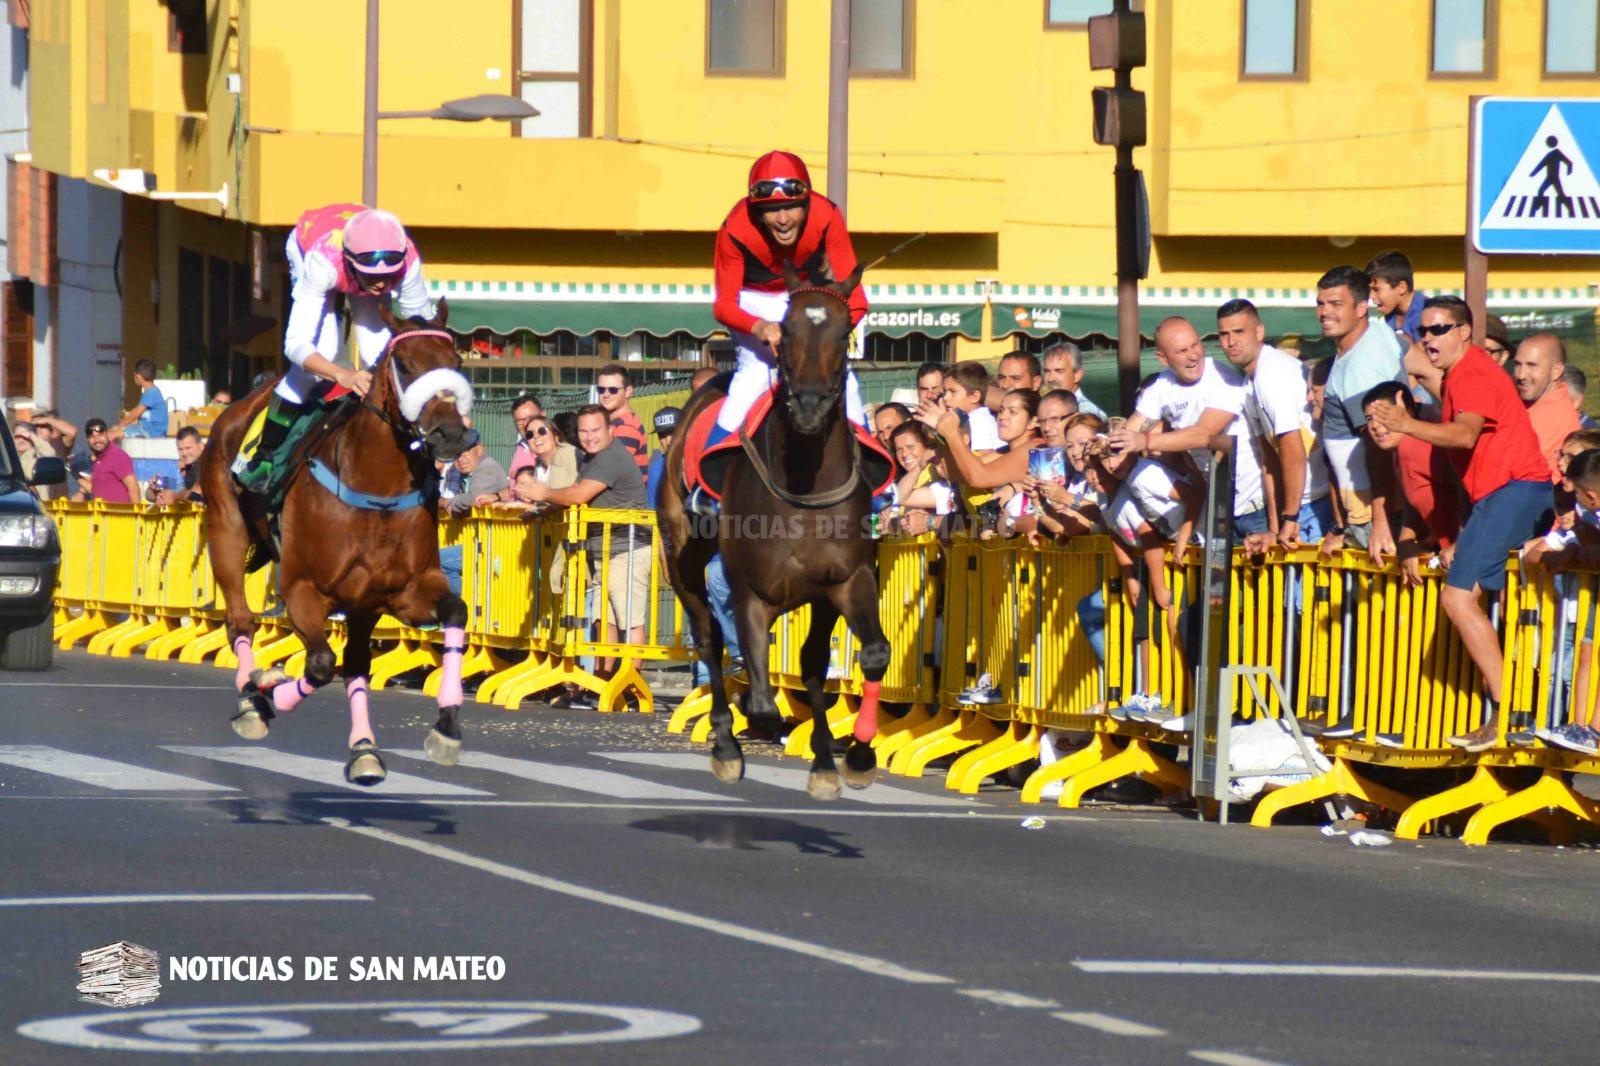 Carreras de caballos en San Mateo Avda. Tinamar Foto Laura Miranda 21 de sept 2018 Noticias de San Mateo